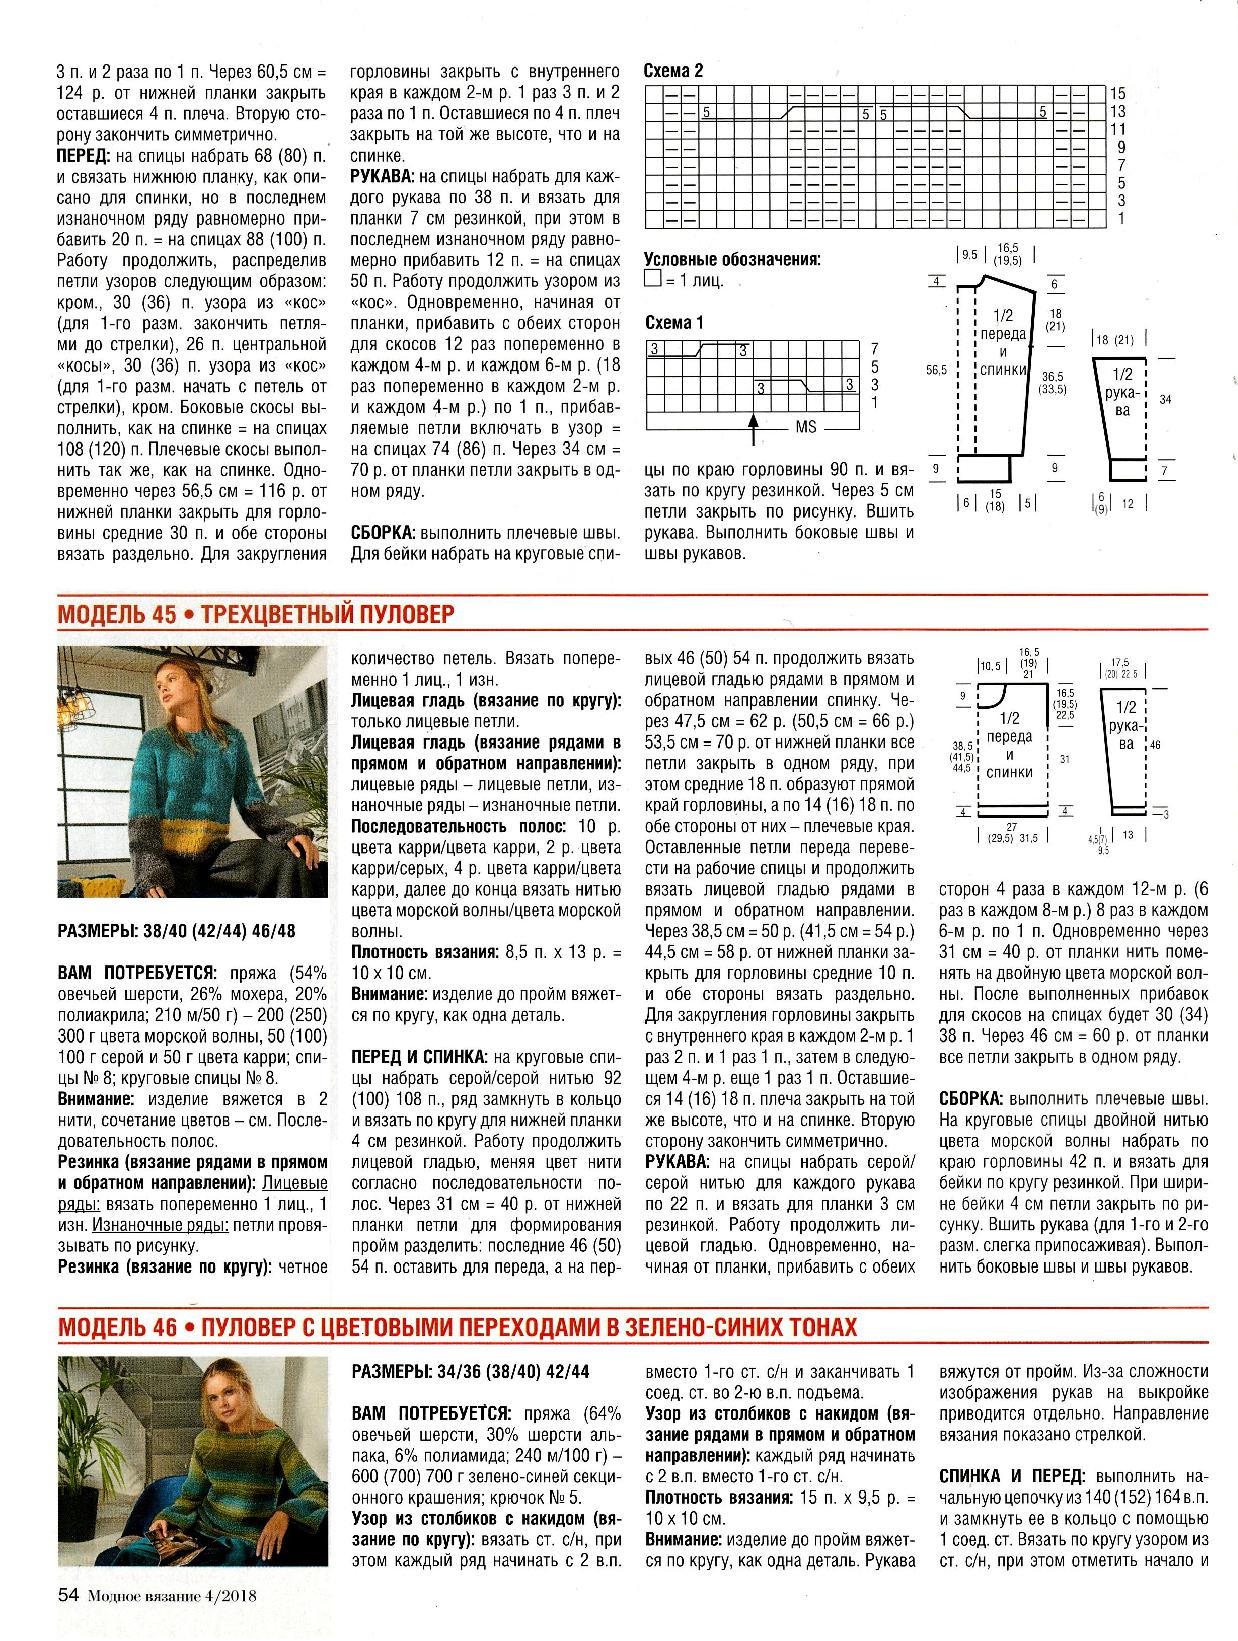 Page_00054.jpg